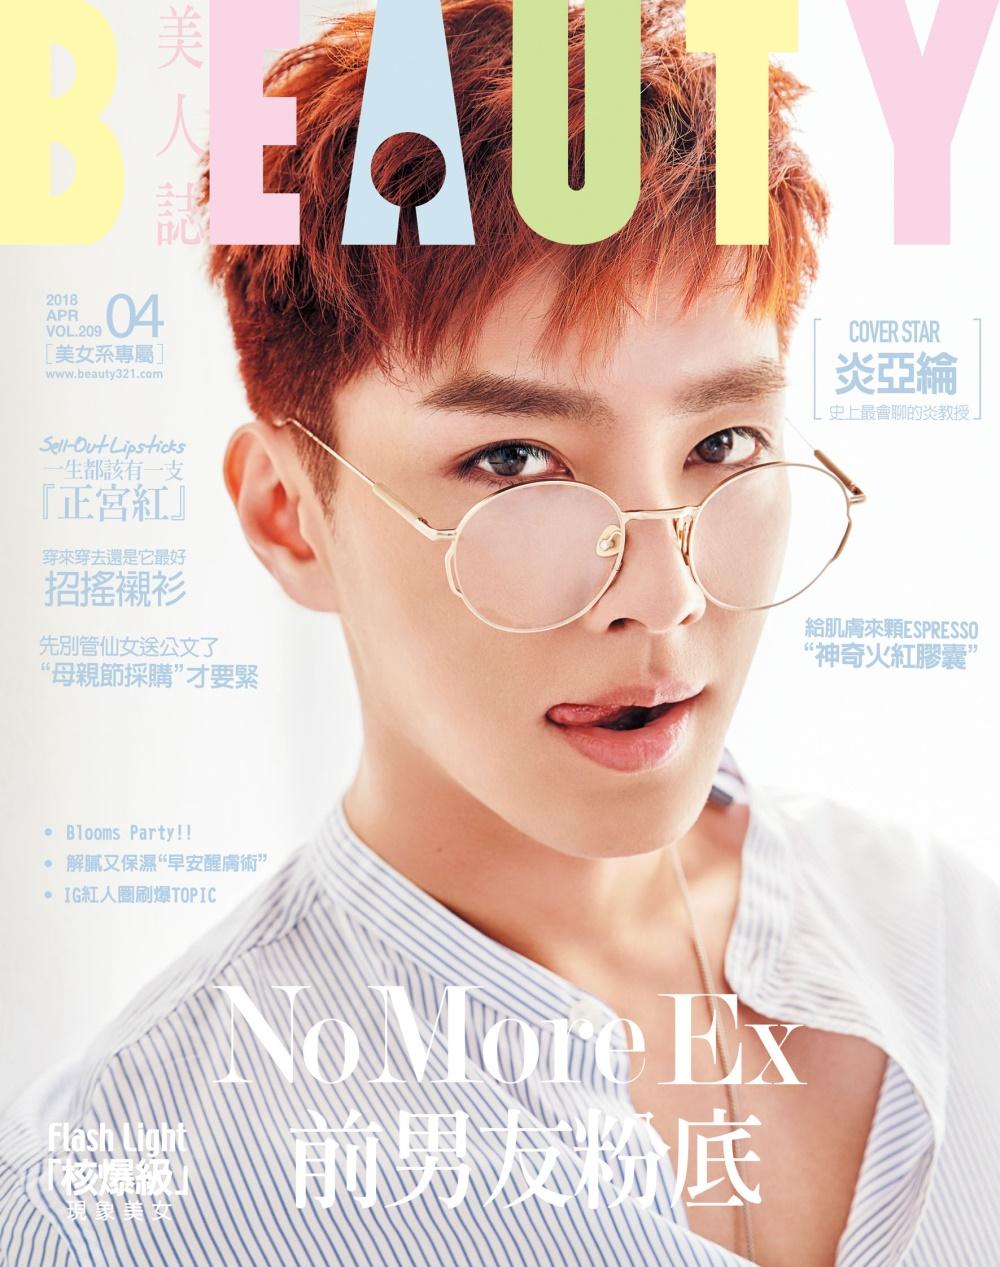 BEAUTY美人誌 4月號/2018 第209期 炎亞綸